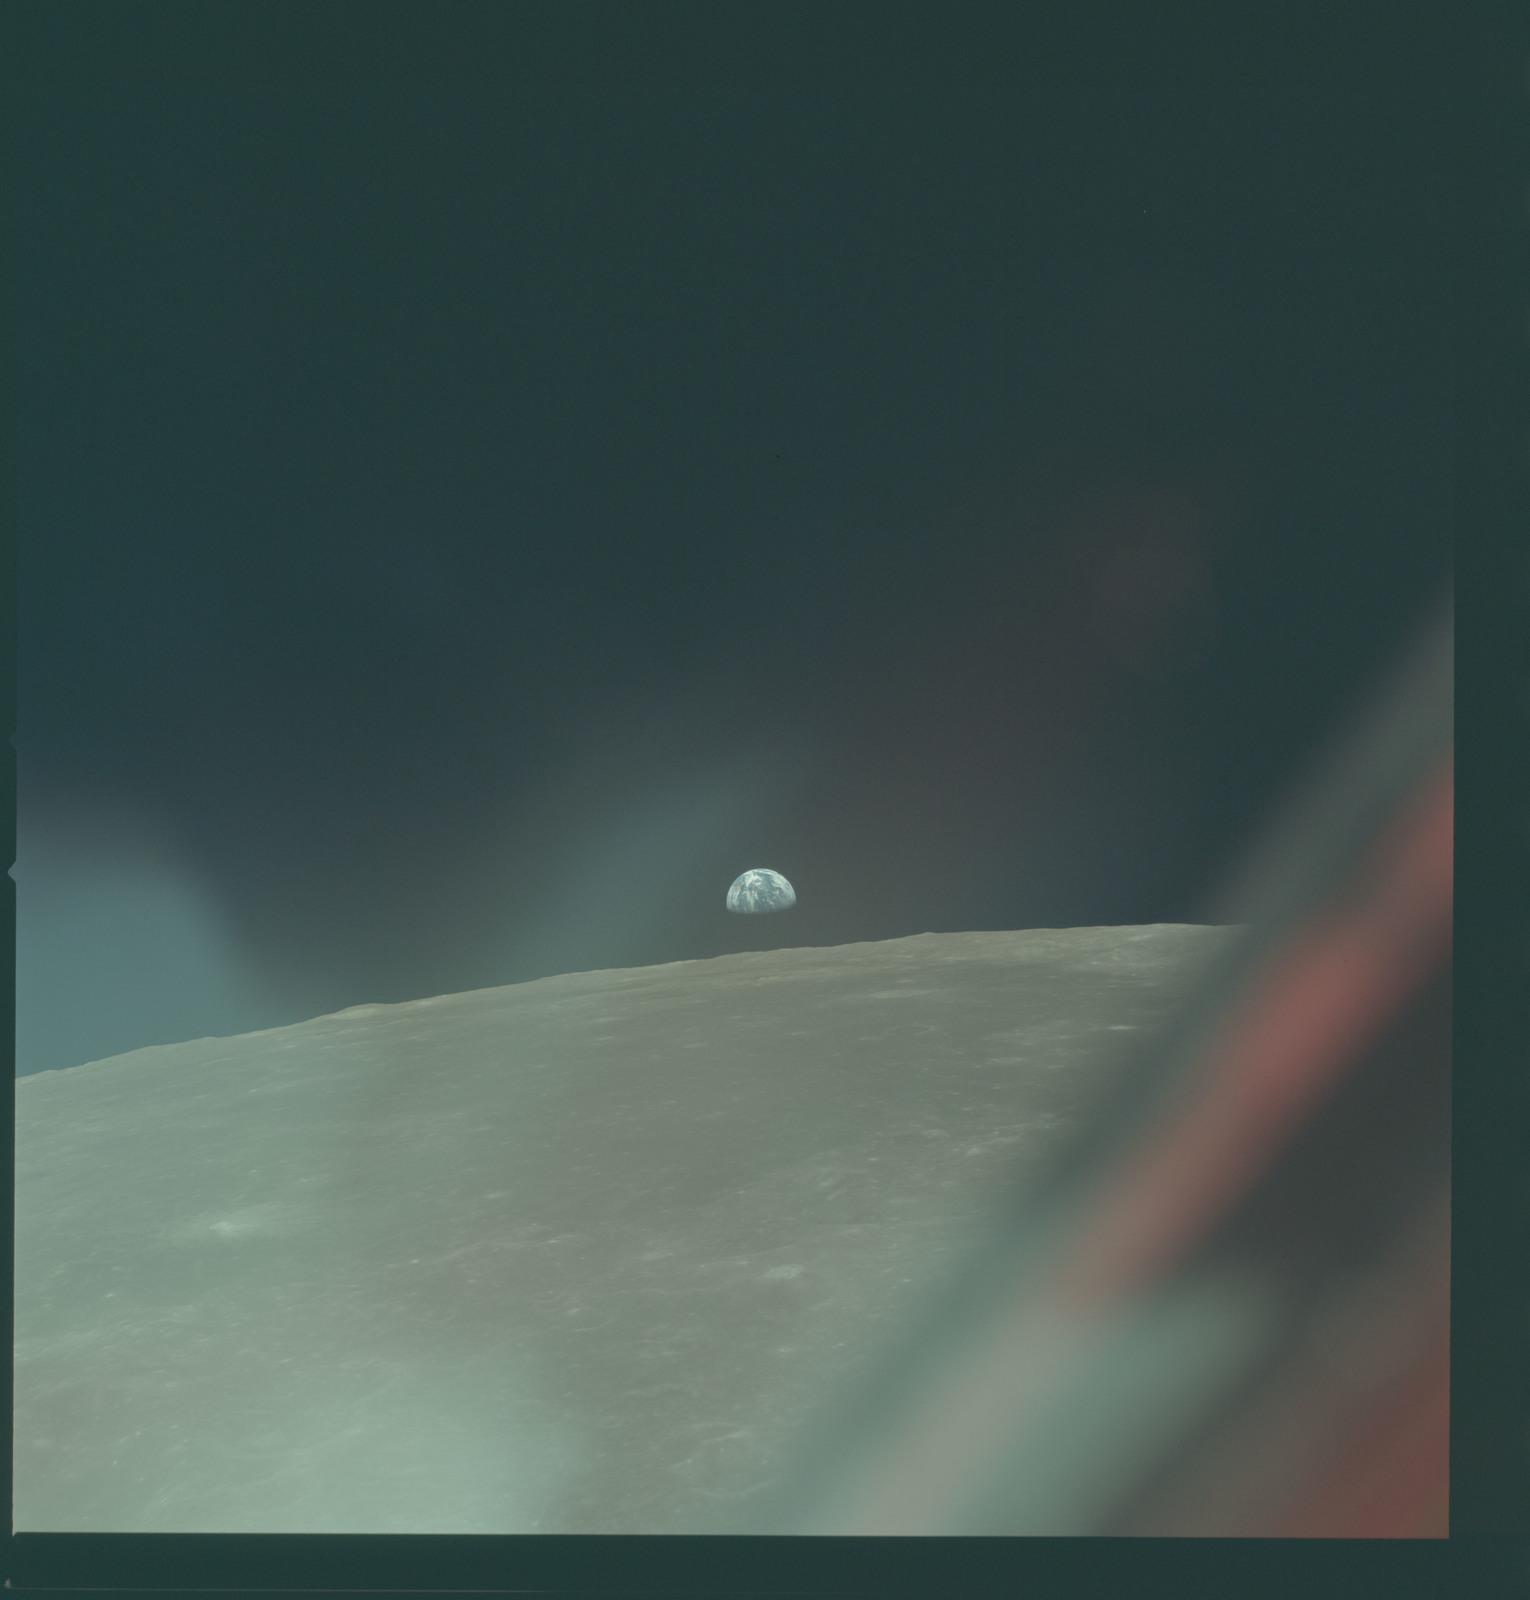 AS11-44-6604 - Apollo 11 - Apollo 11 Mission image - View of Moon limb with Earth on the horizon